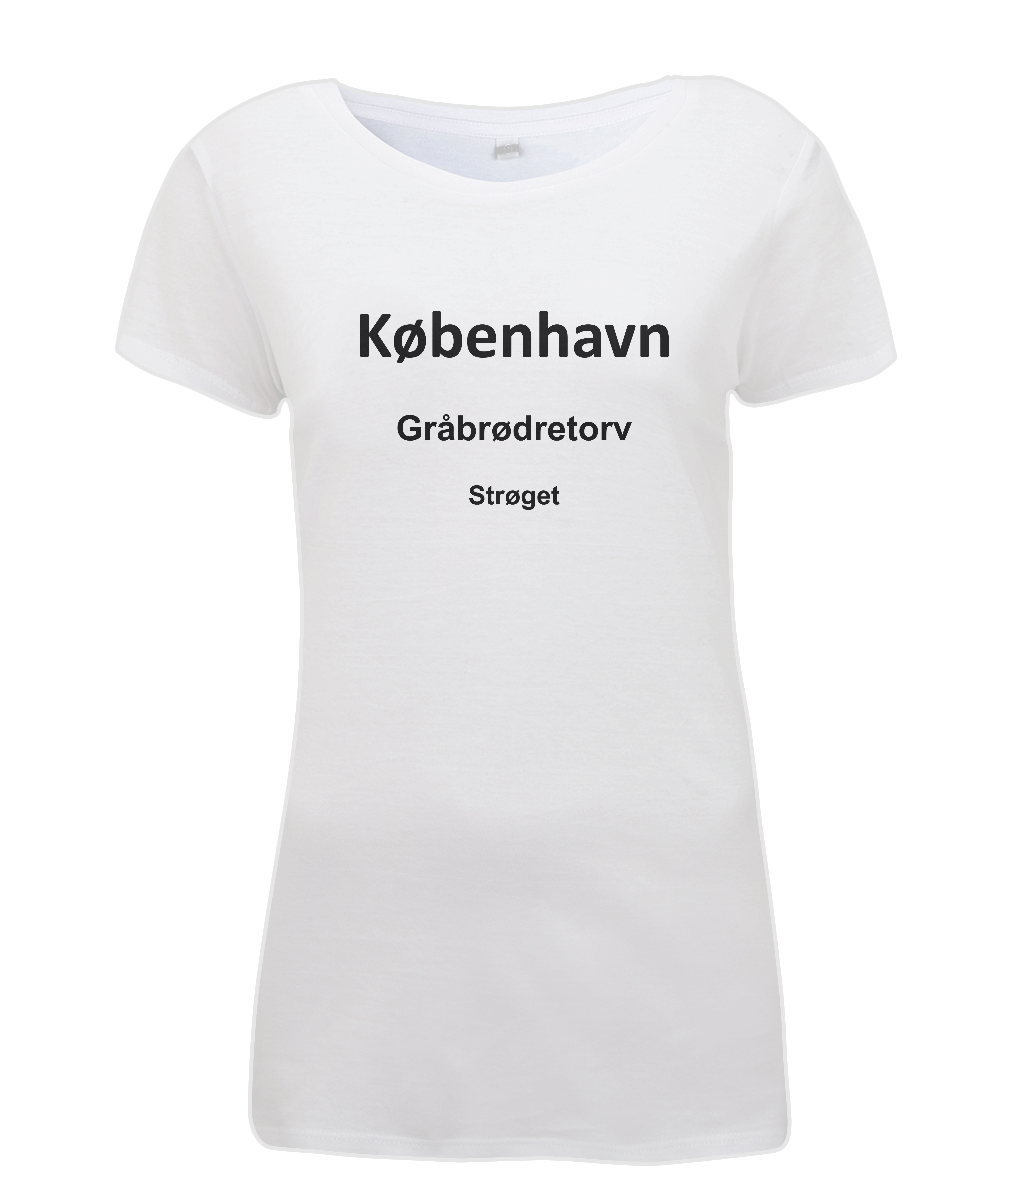 a155bf2f86ca Xtreem L104 White København - T-Shirt.UK